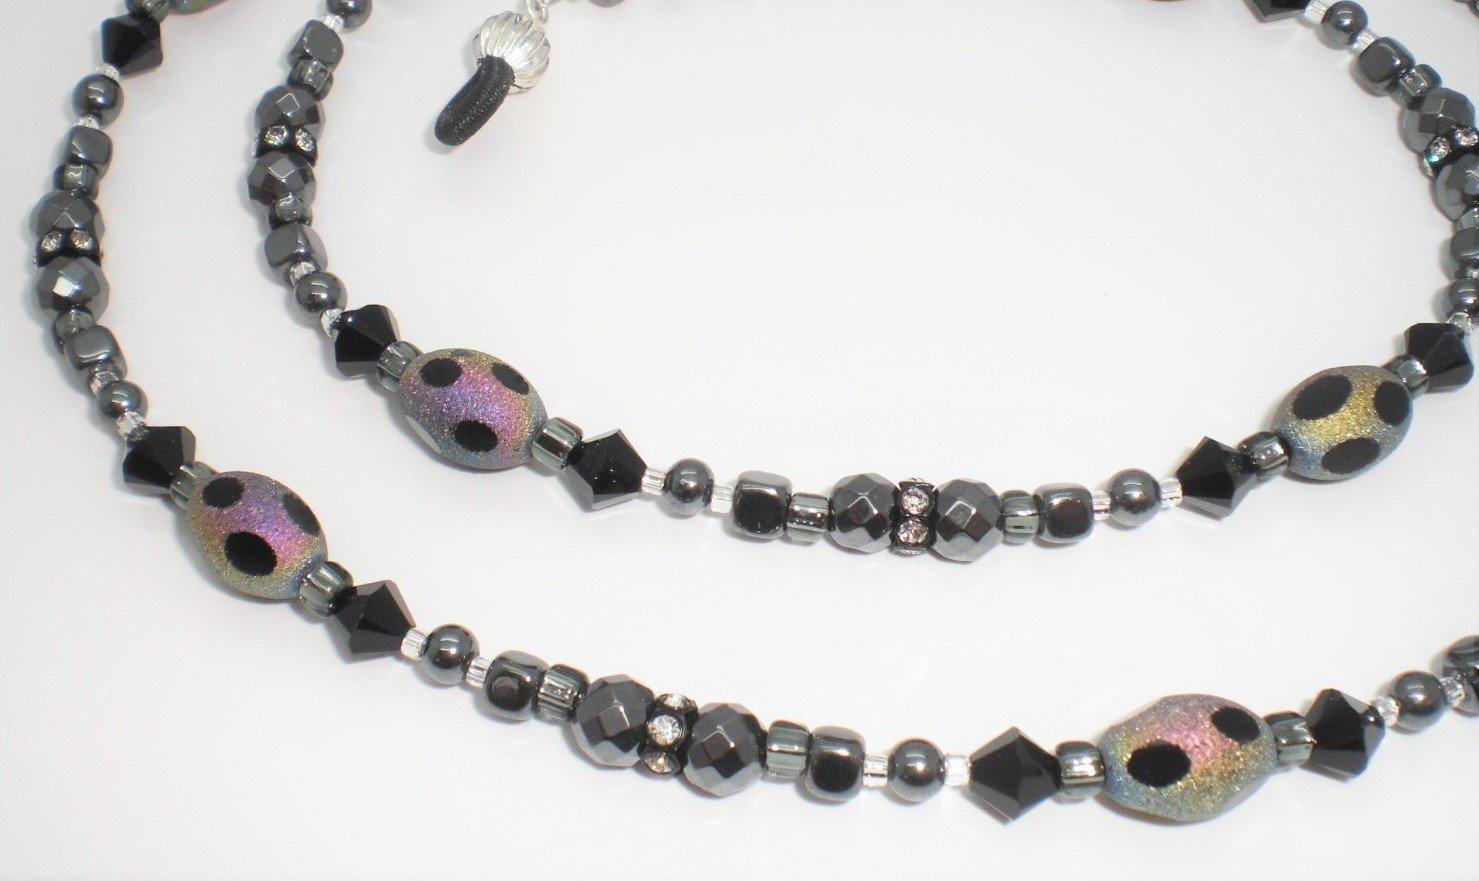 ac1a9078f43d Amazon.com  Jet   Black Austrian Crystals Hematite Beaded Eyeglass Chain   Arts